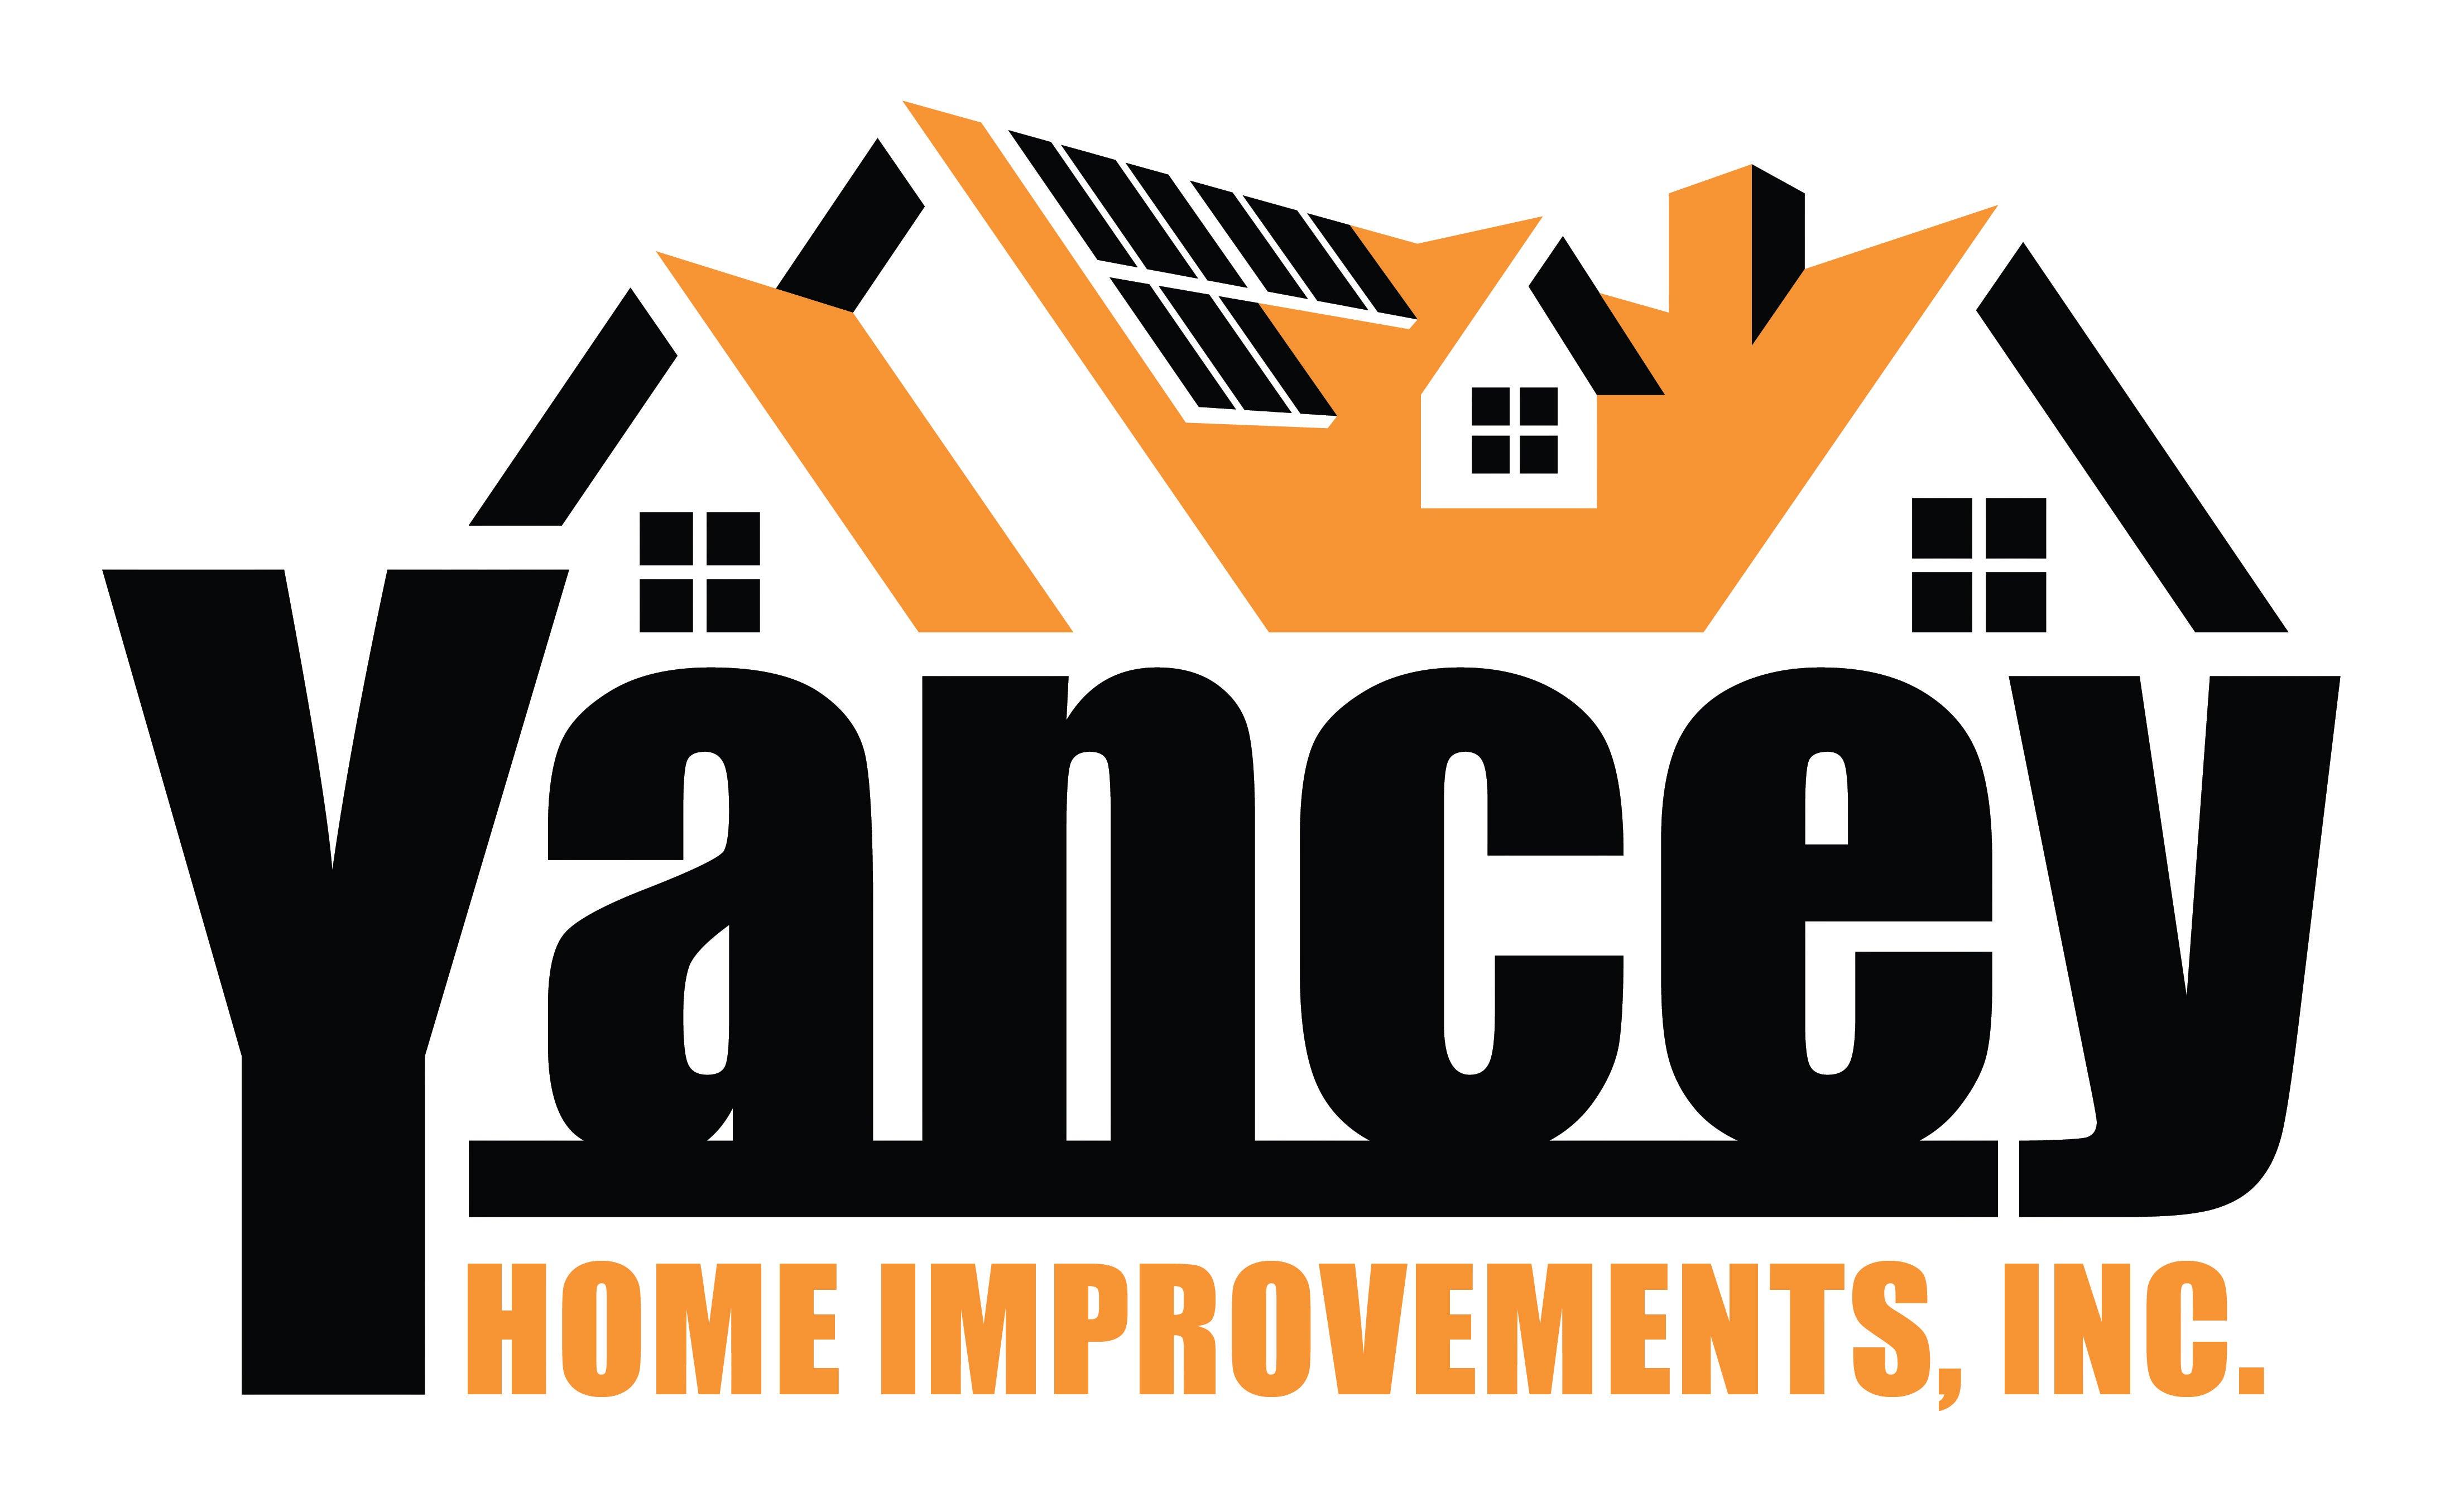 Yancey Home Improvements